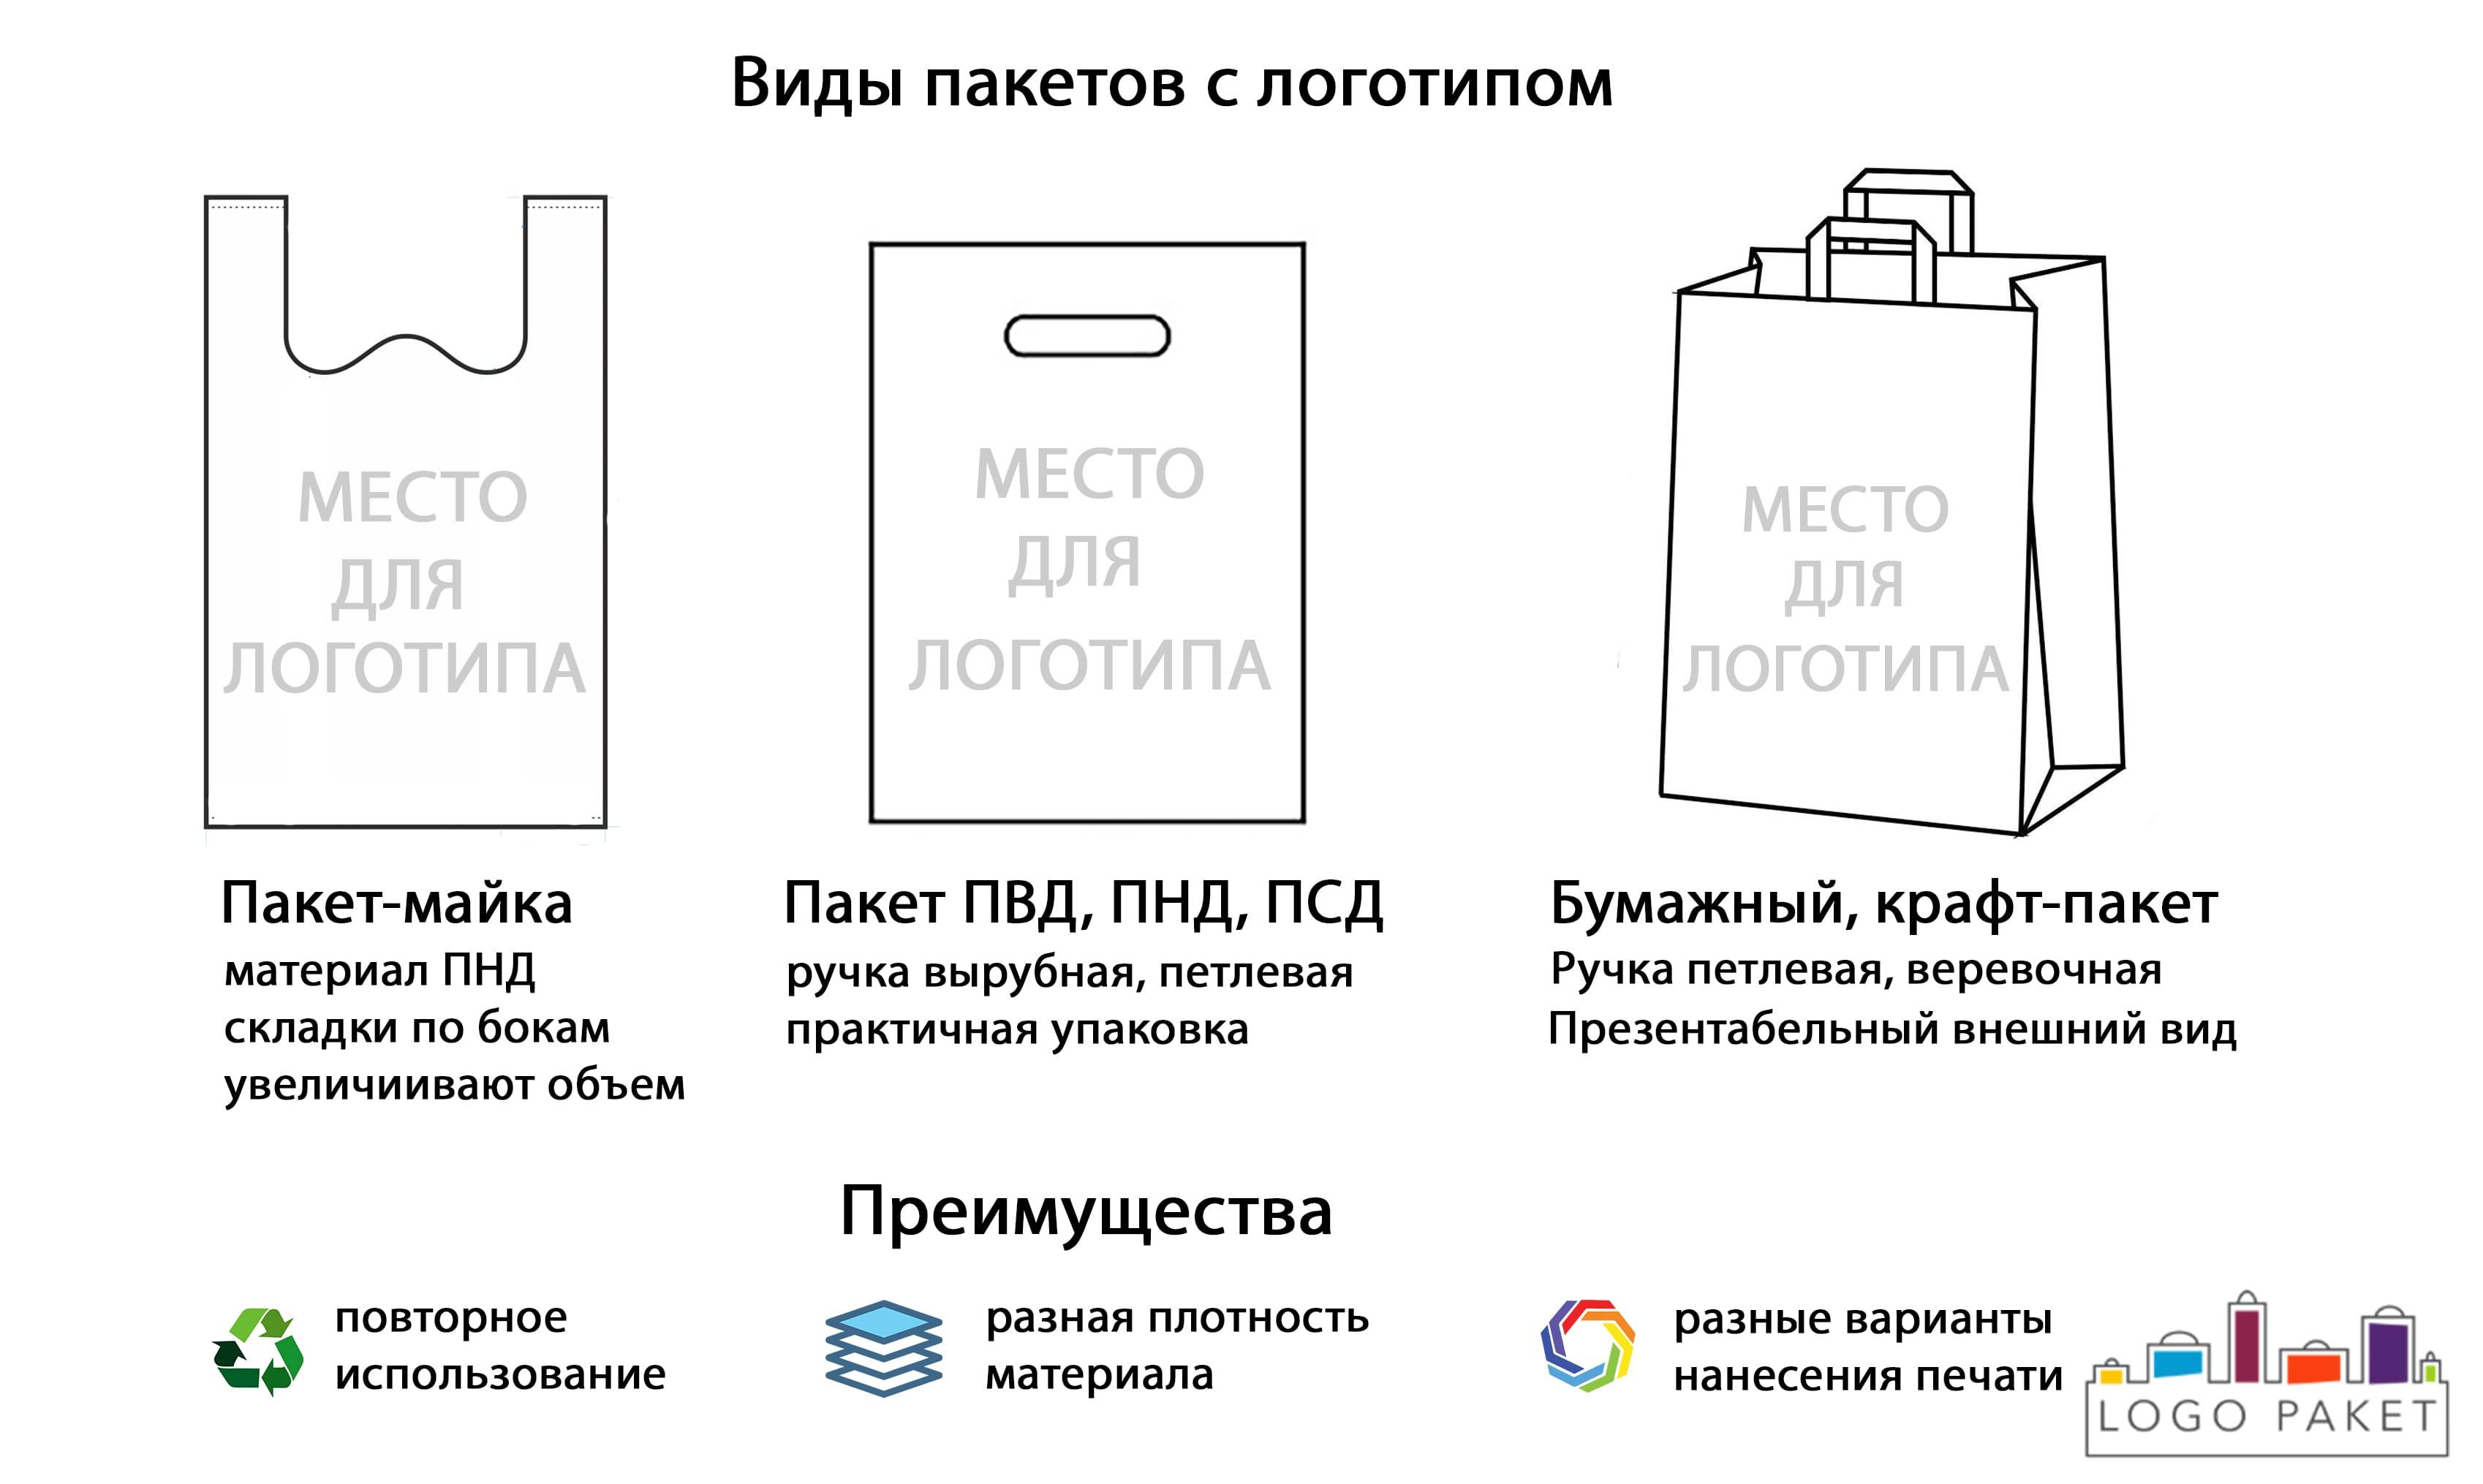 Пакеты с логотипом инфографика